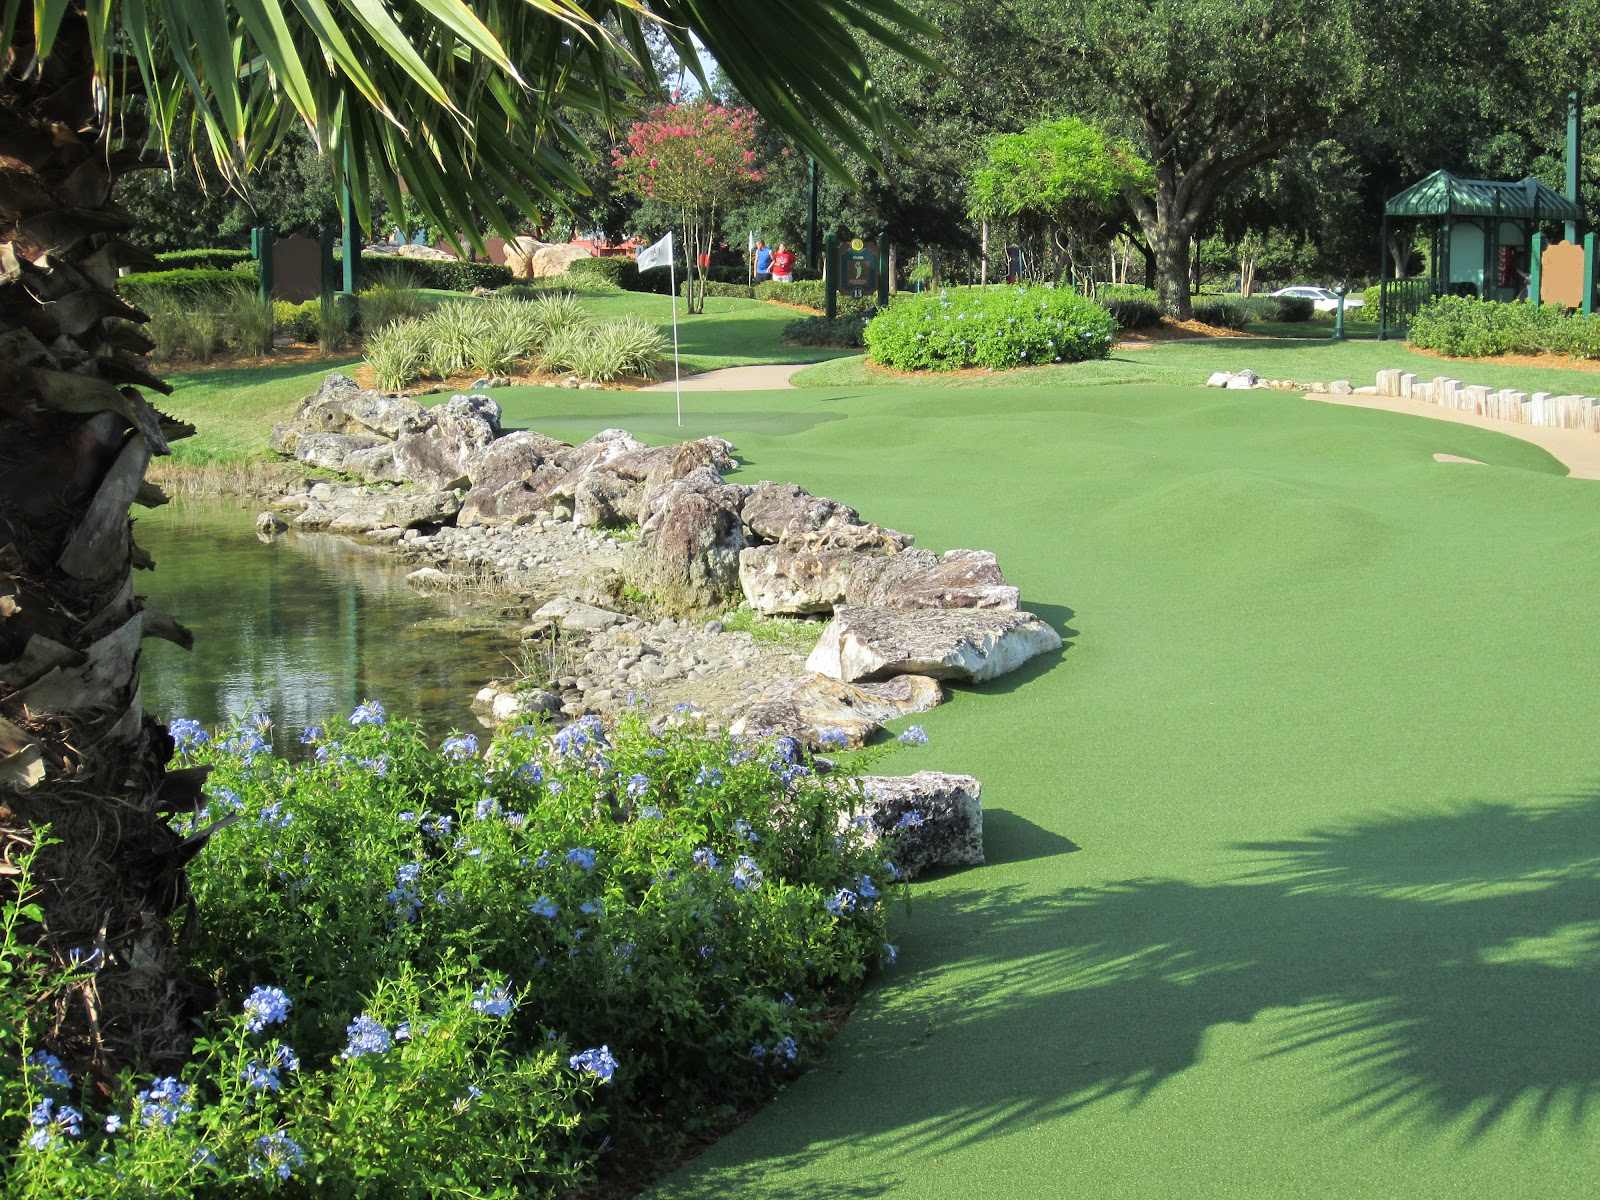 Fantasia Gardens And Fairways Miniature Golf Coupon